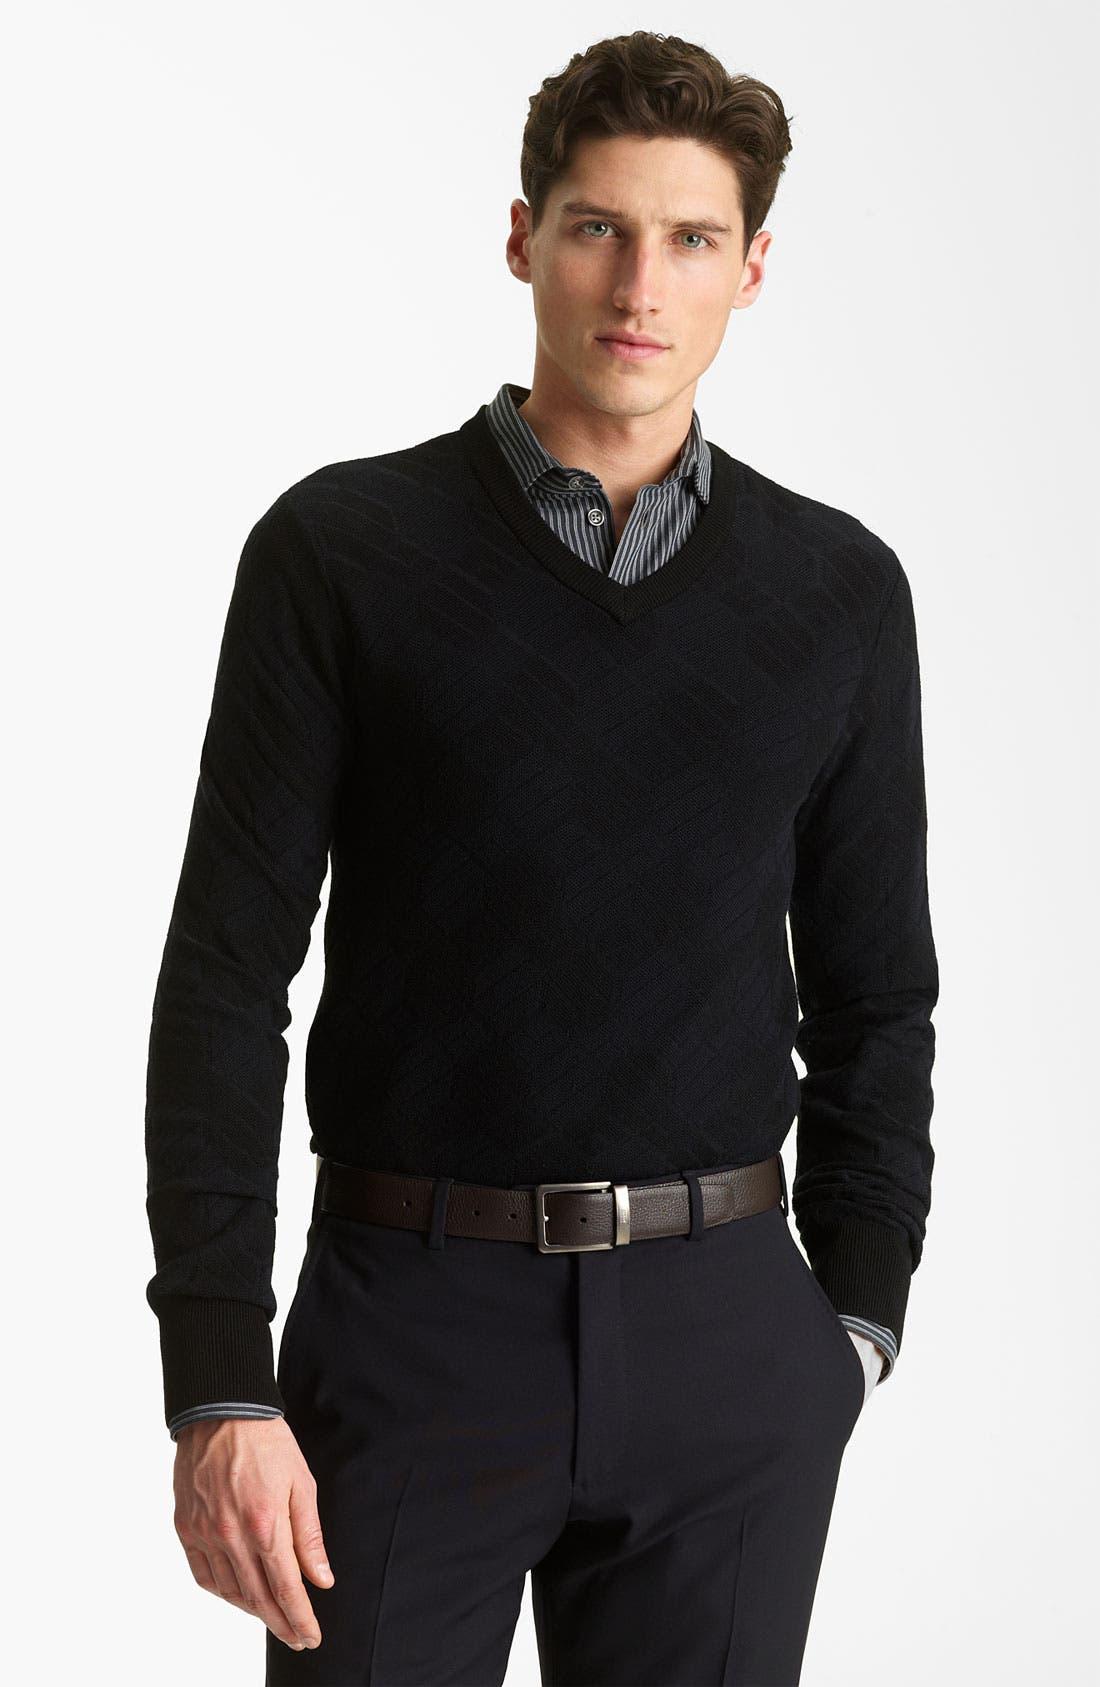 Alternate Image 1 Selected - Armani Collezioni V-Neck Knit Sweater